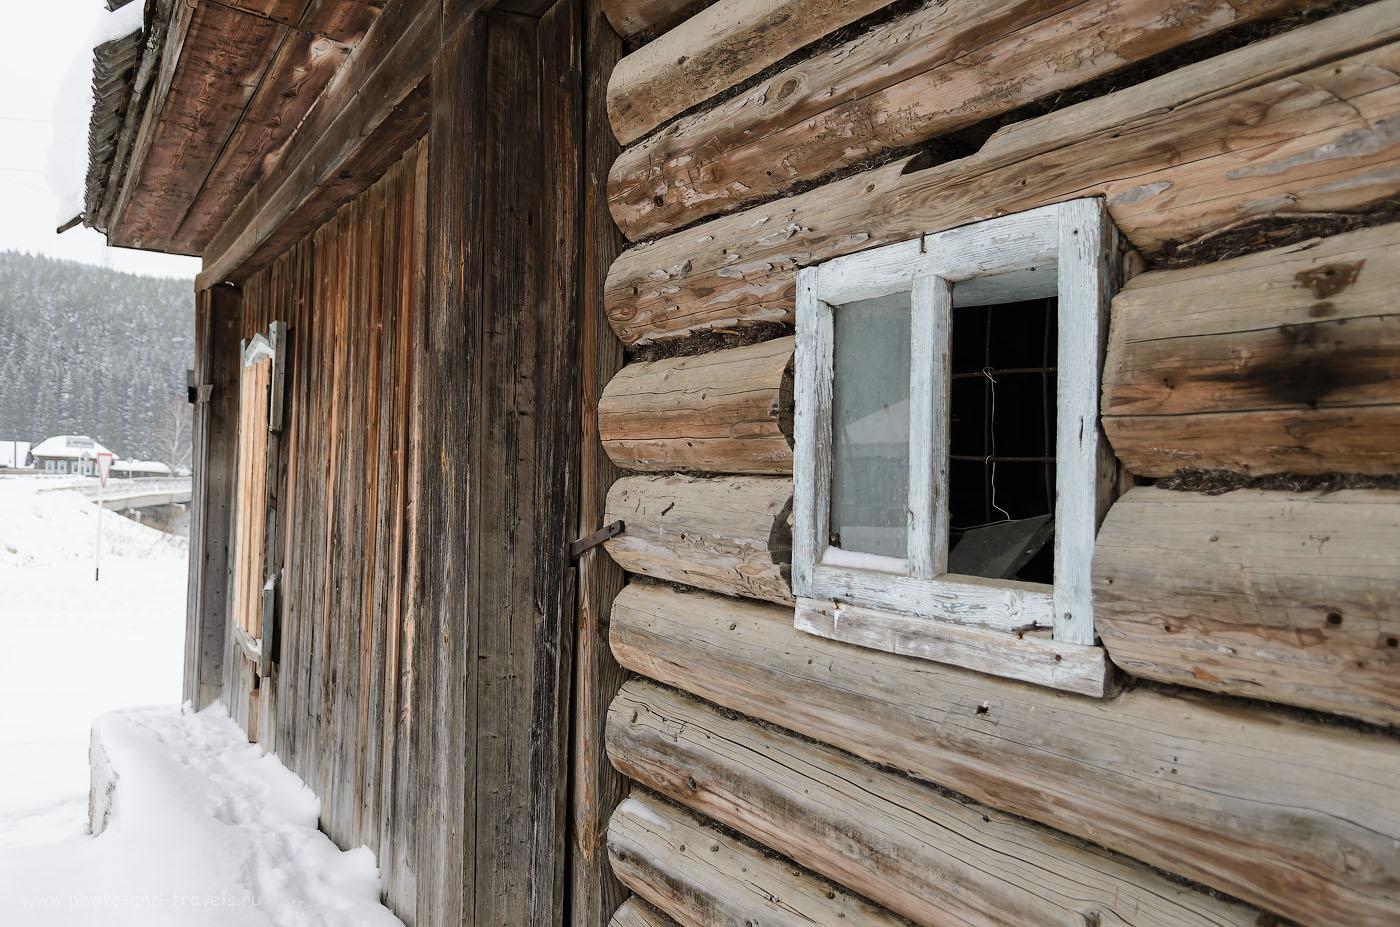 Фотография 30. Текстуры. Зимний фоторепортаж